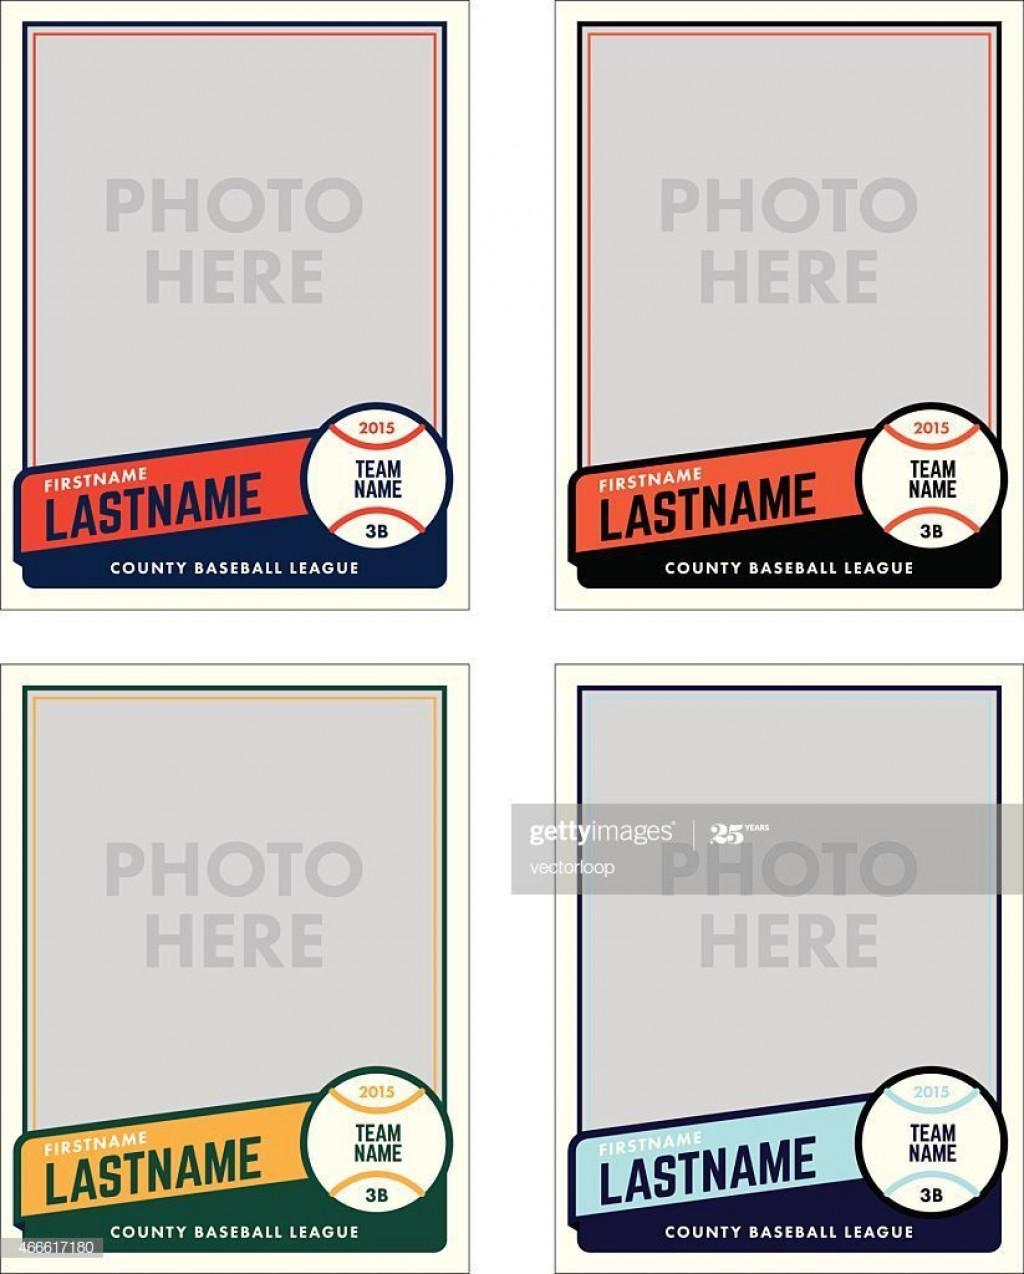 003 Wondrou Baseball Card Template Photoshop Highest Quality  Topp FreeLarge